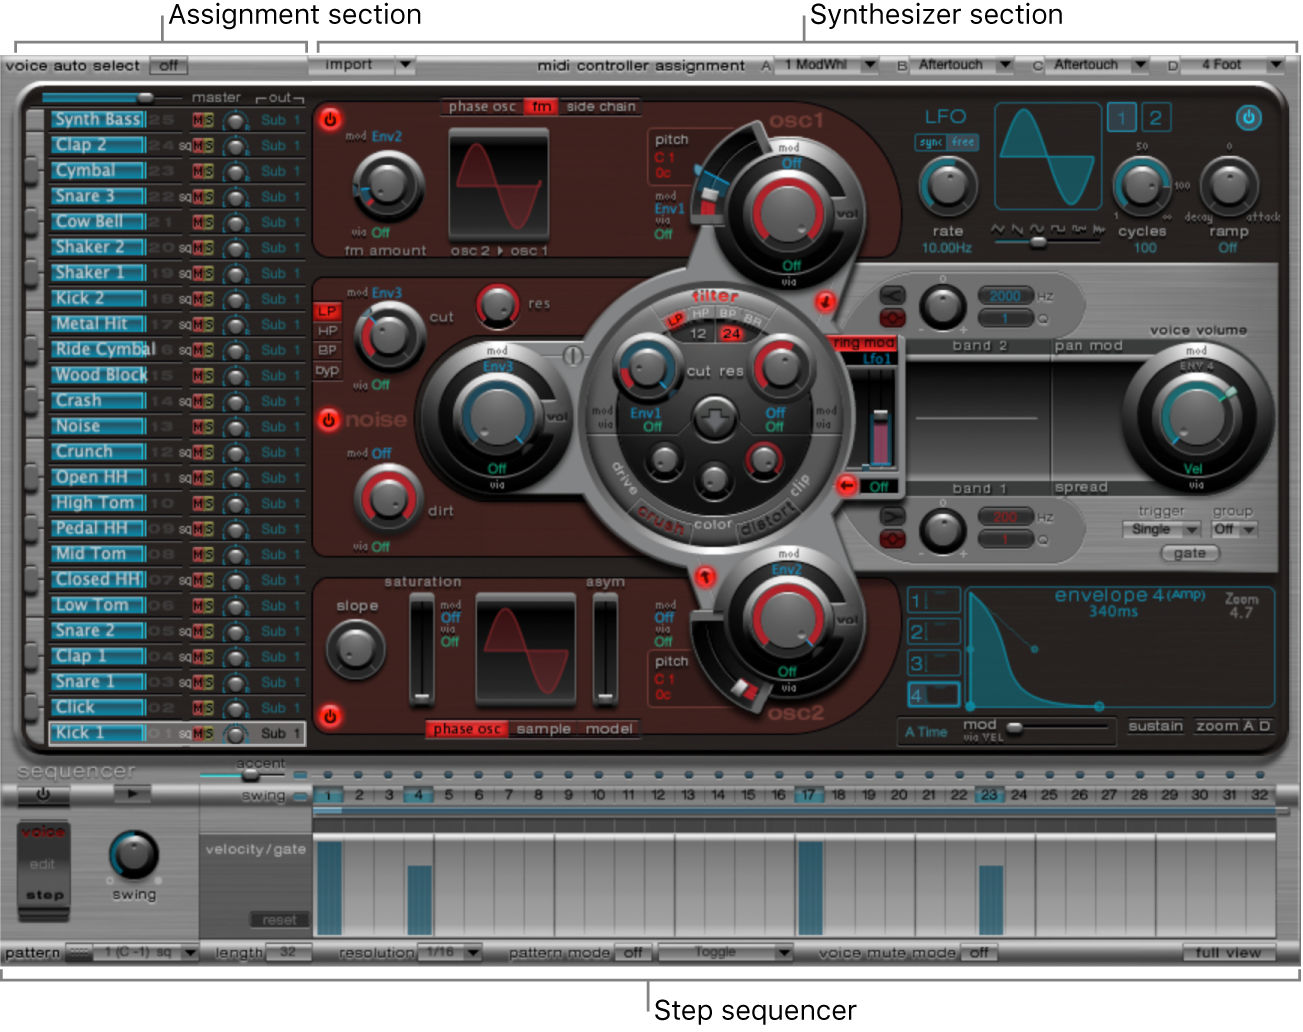 Figure. Ultrabeat window, showing main interface areas.